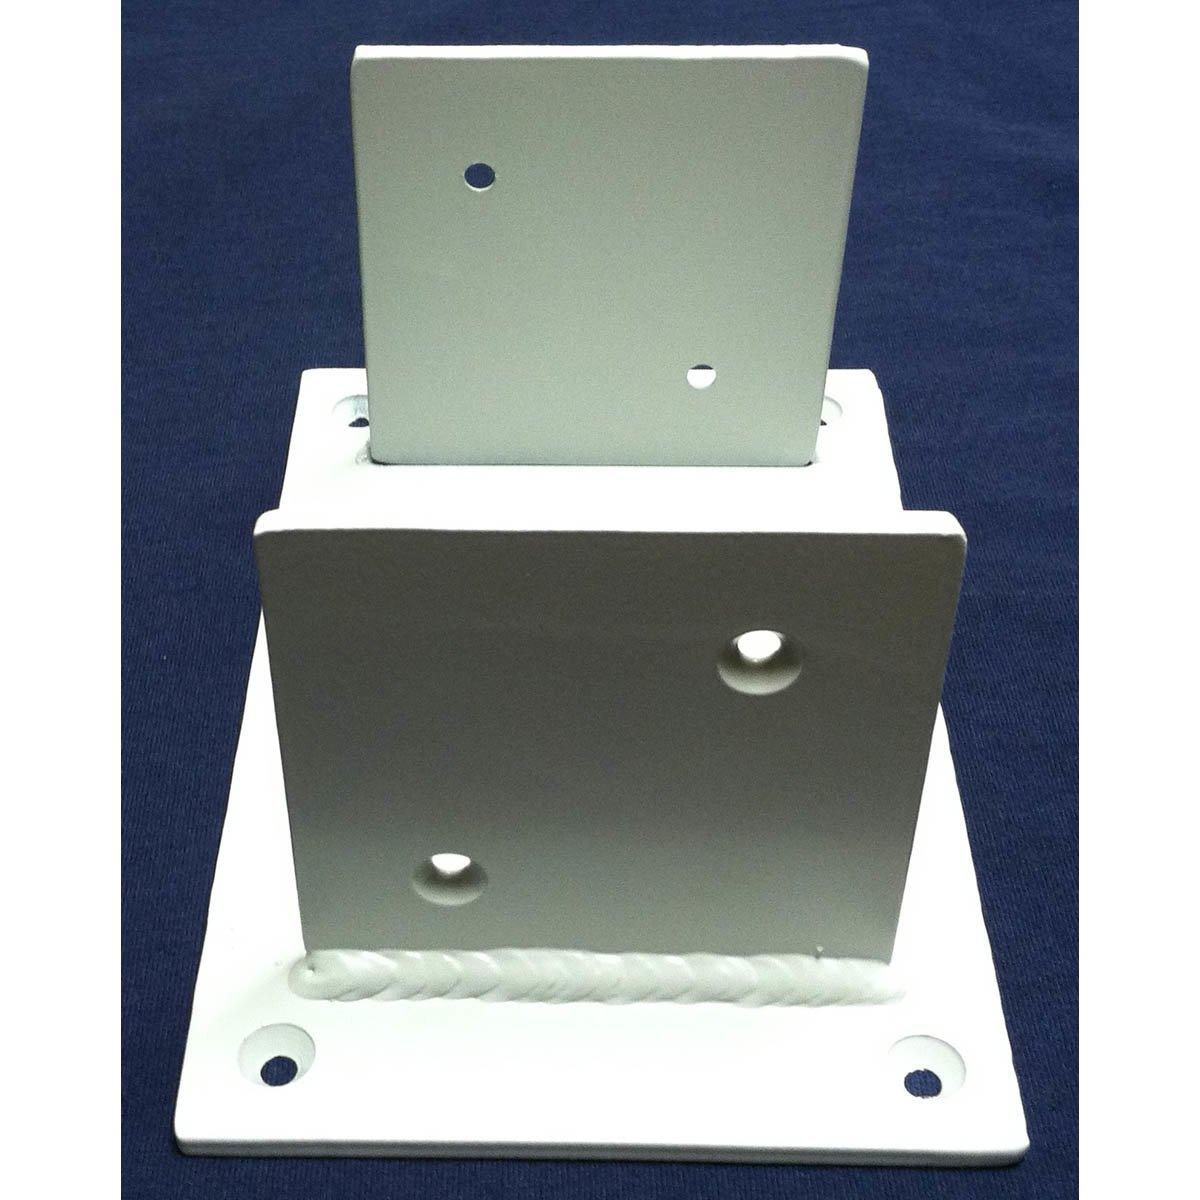 2 - Sided Wood Post Base Brackets Painted White